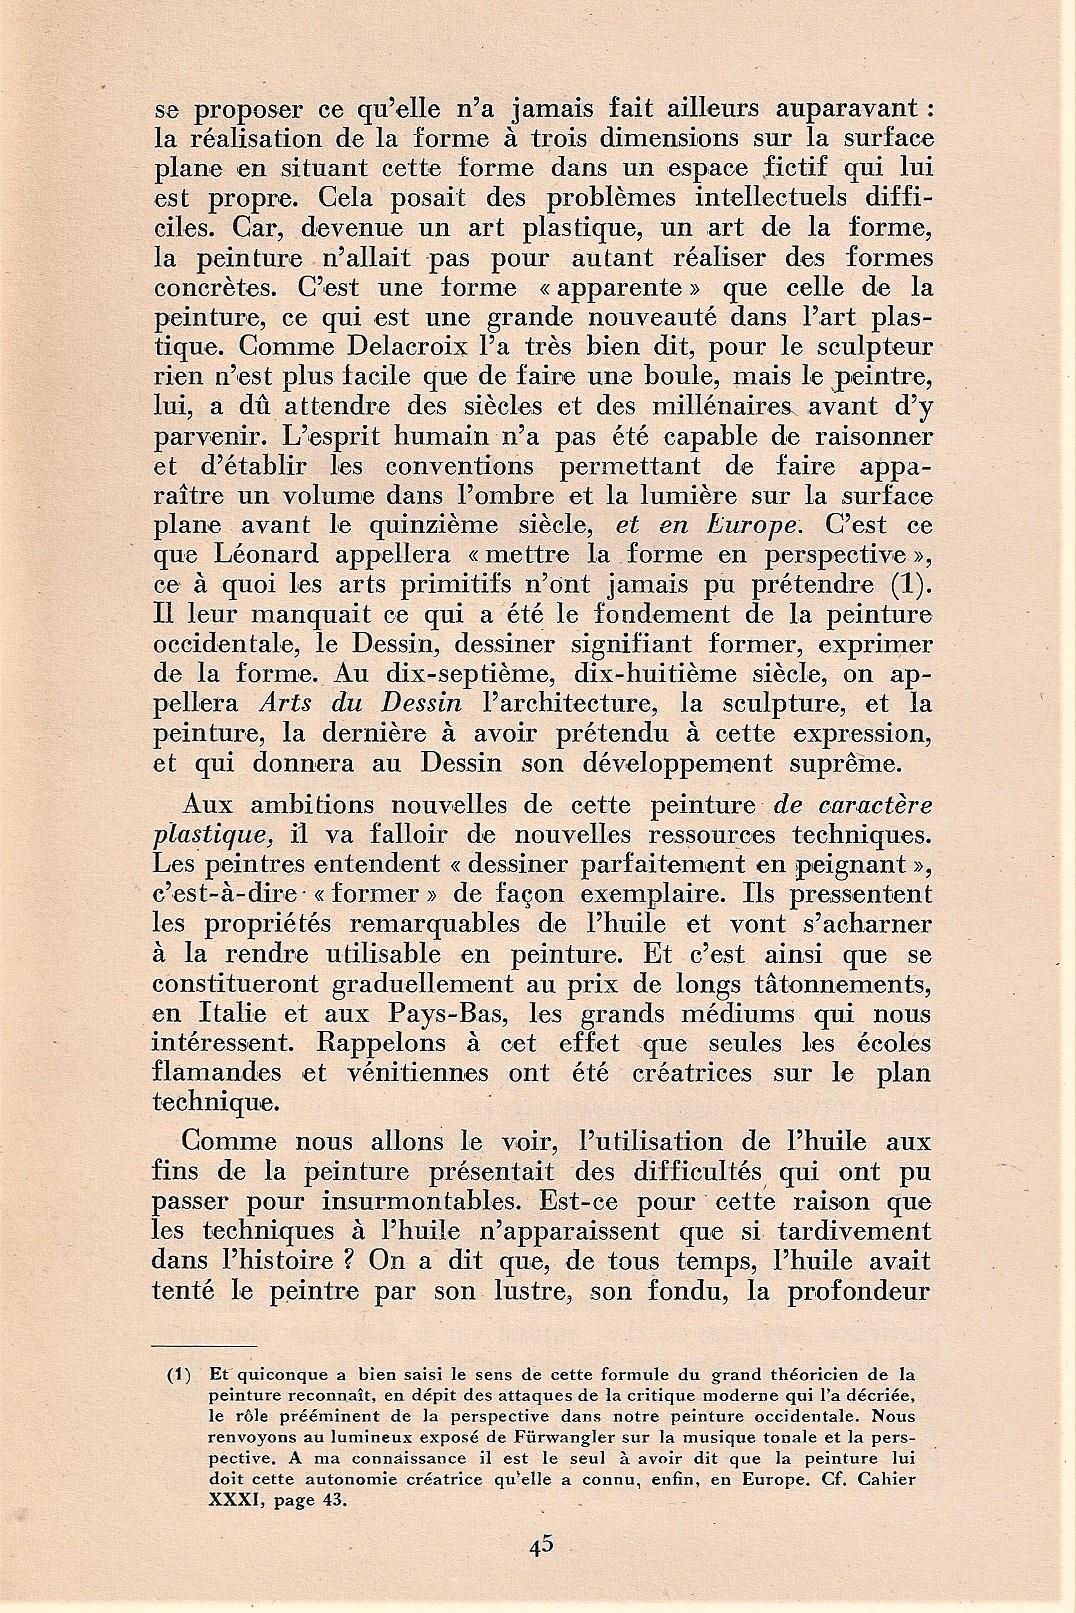 versini-page-45.jpg